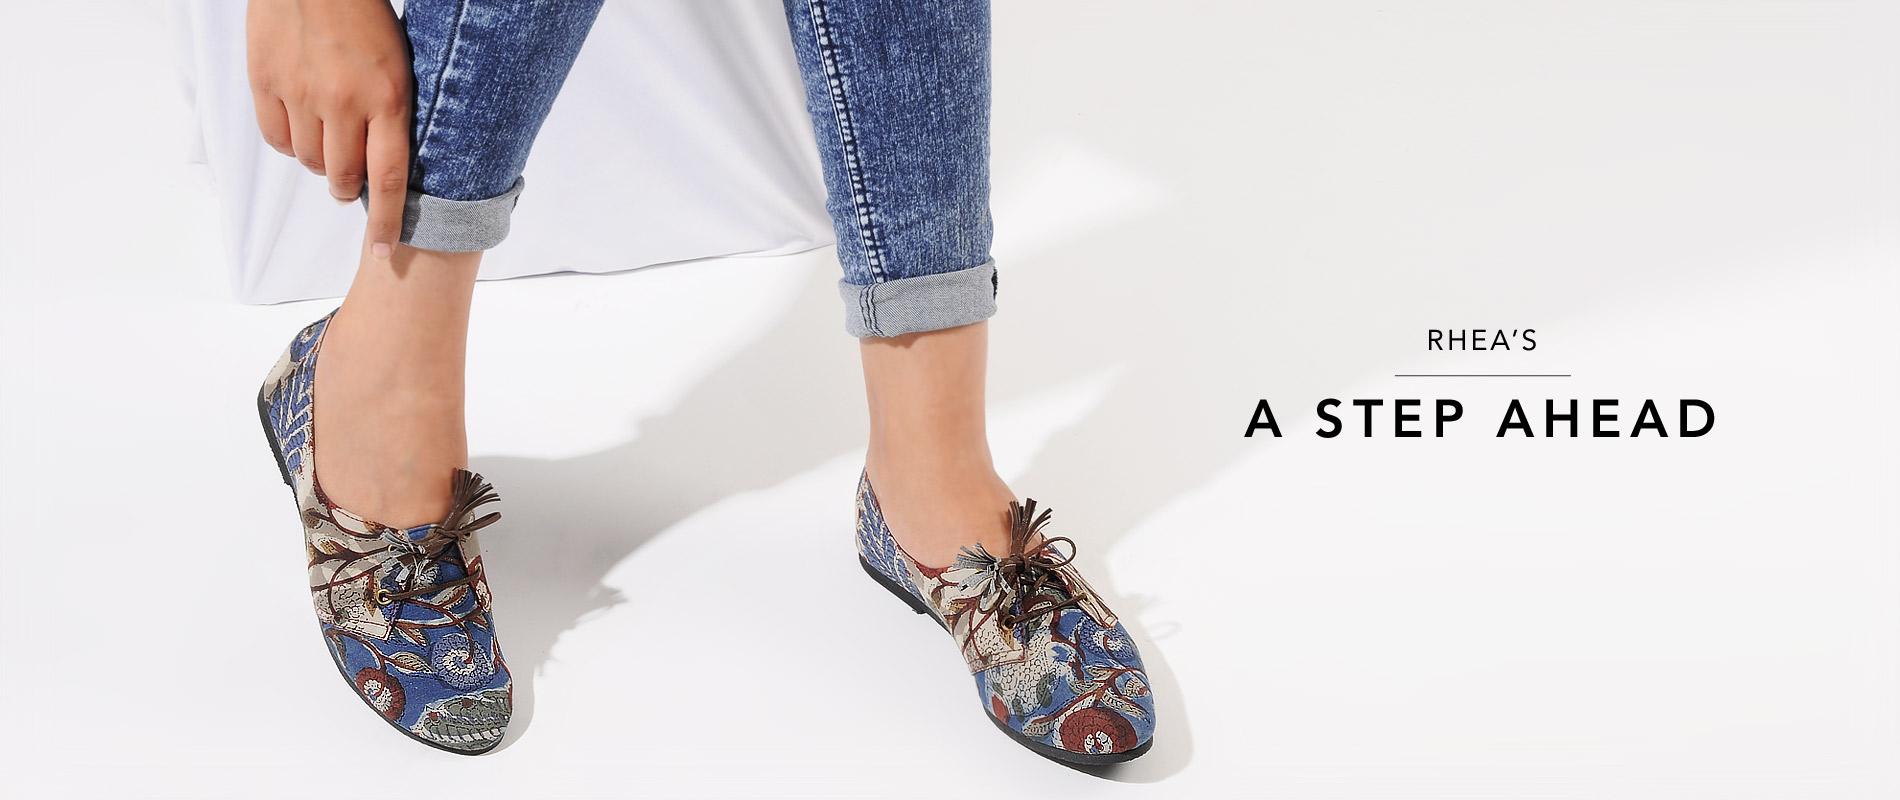 170408RHE010_Rhea_Footwear_6192